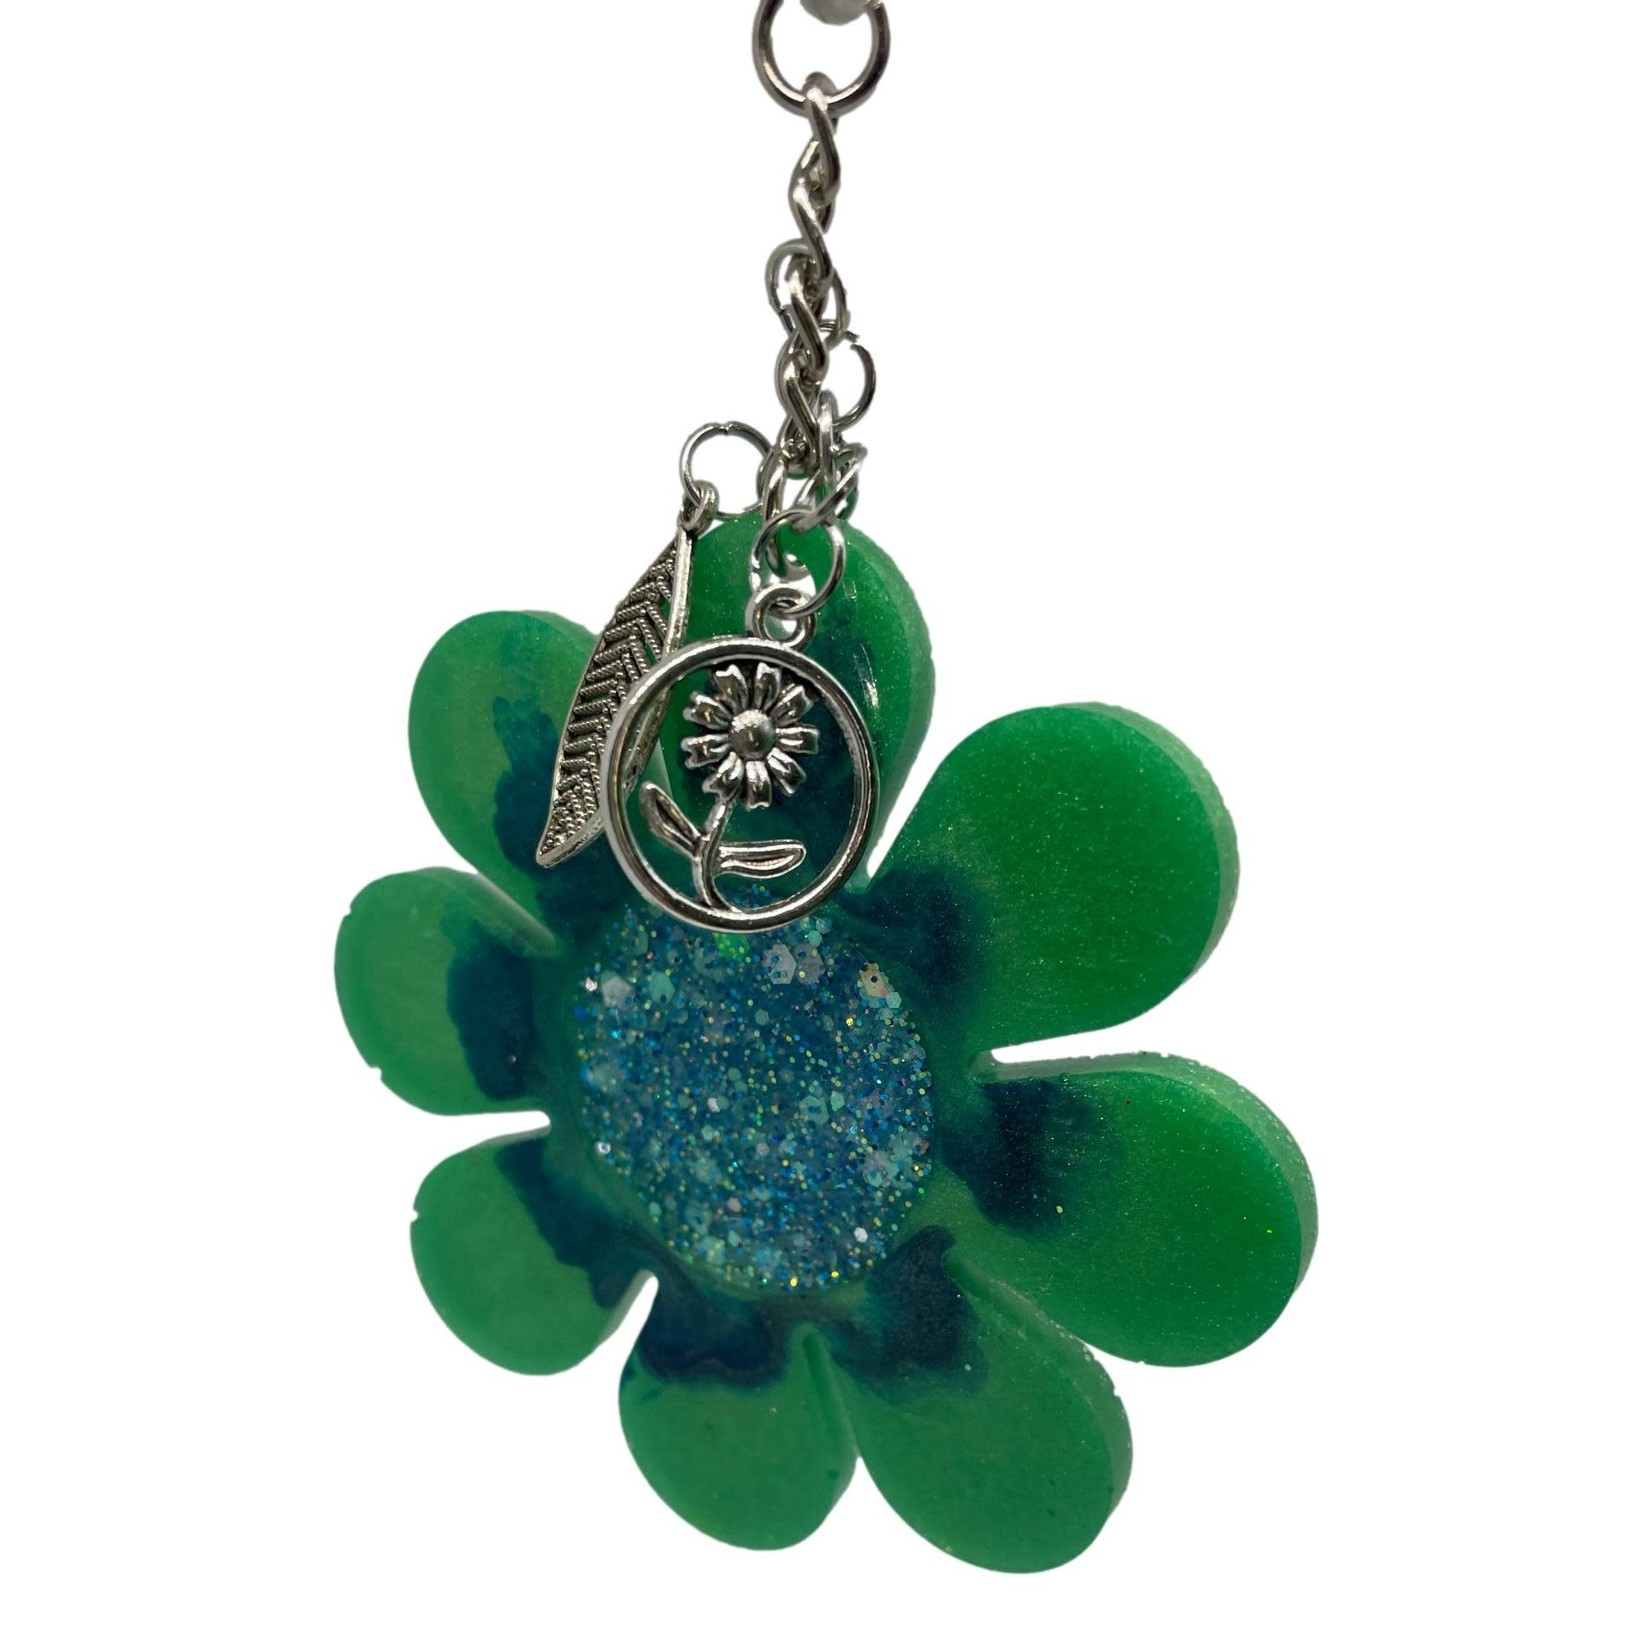 East Coast Sirens Green Flower Key Chain